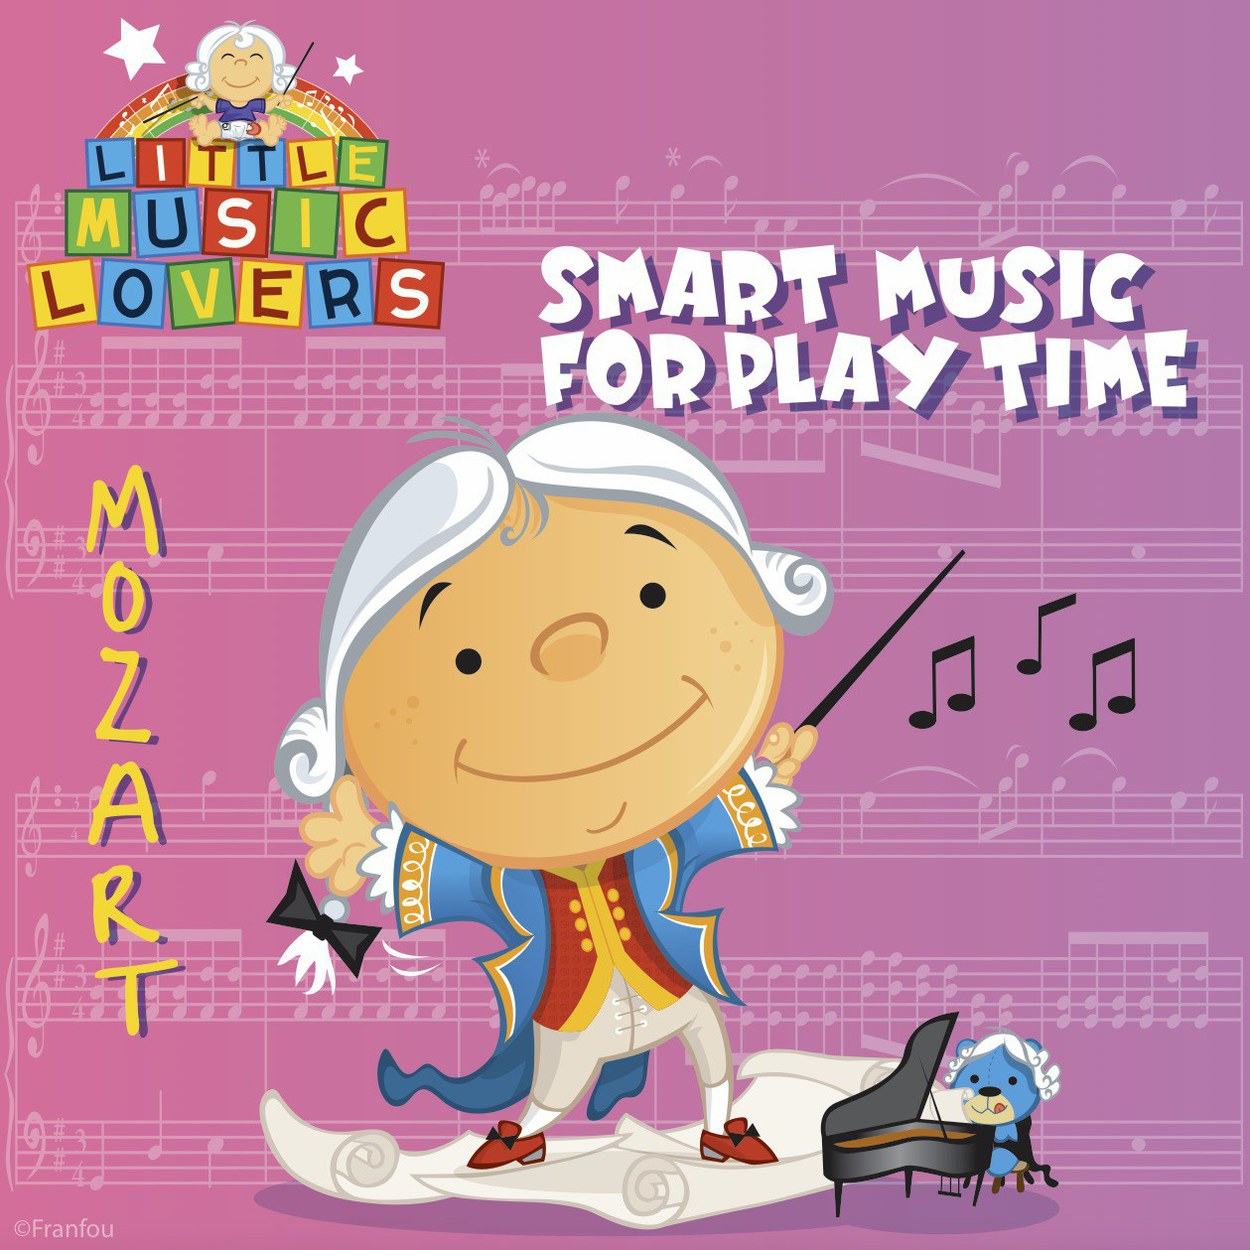 Universal music -Packaging - Mozart